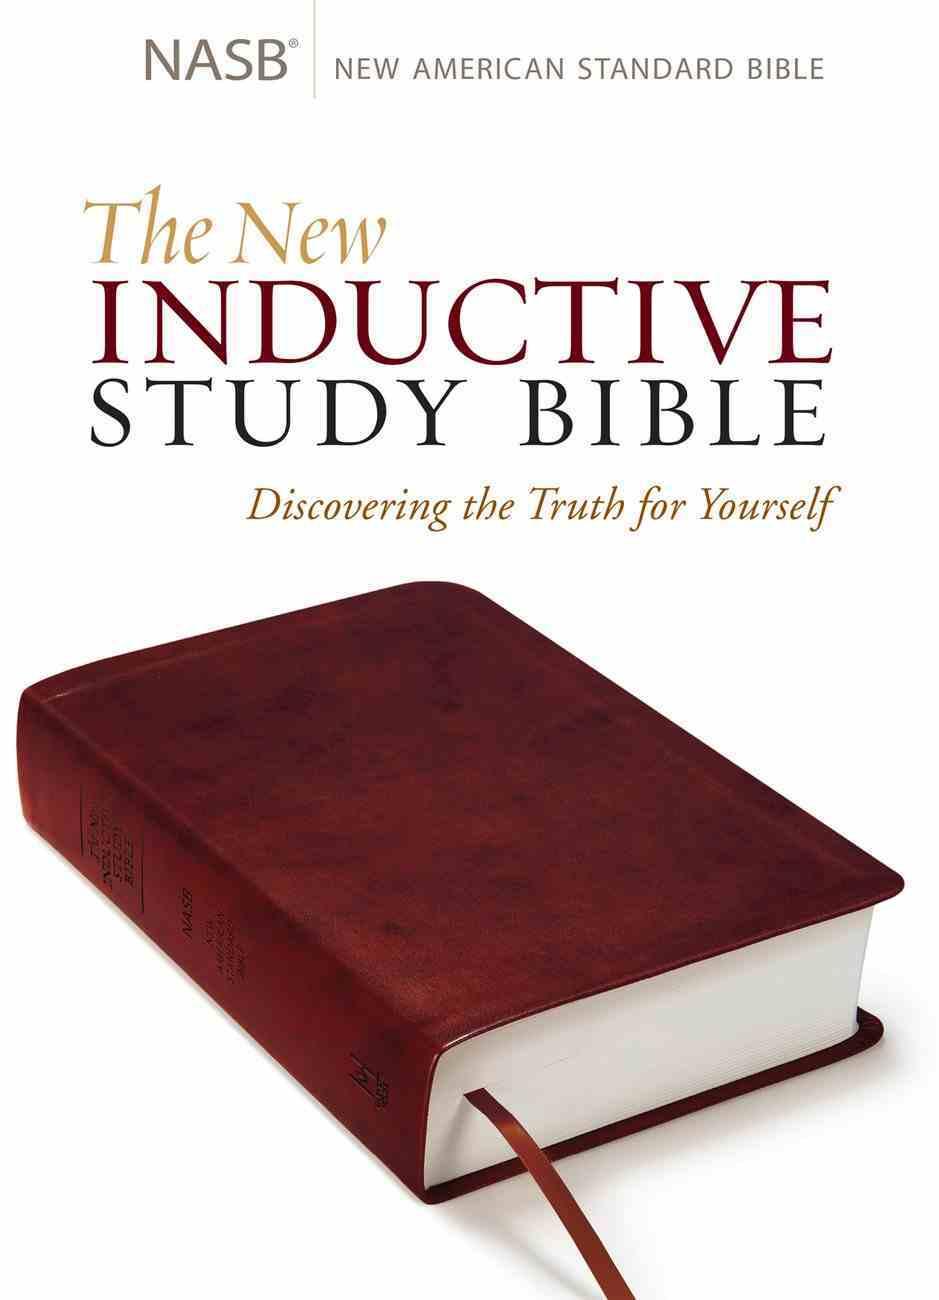 NASB New Inductive Study Bible Milano Burgundy Imitation Leather